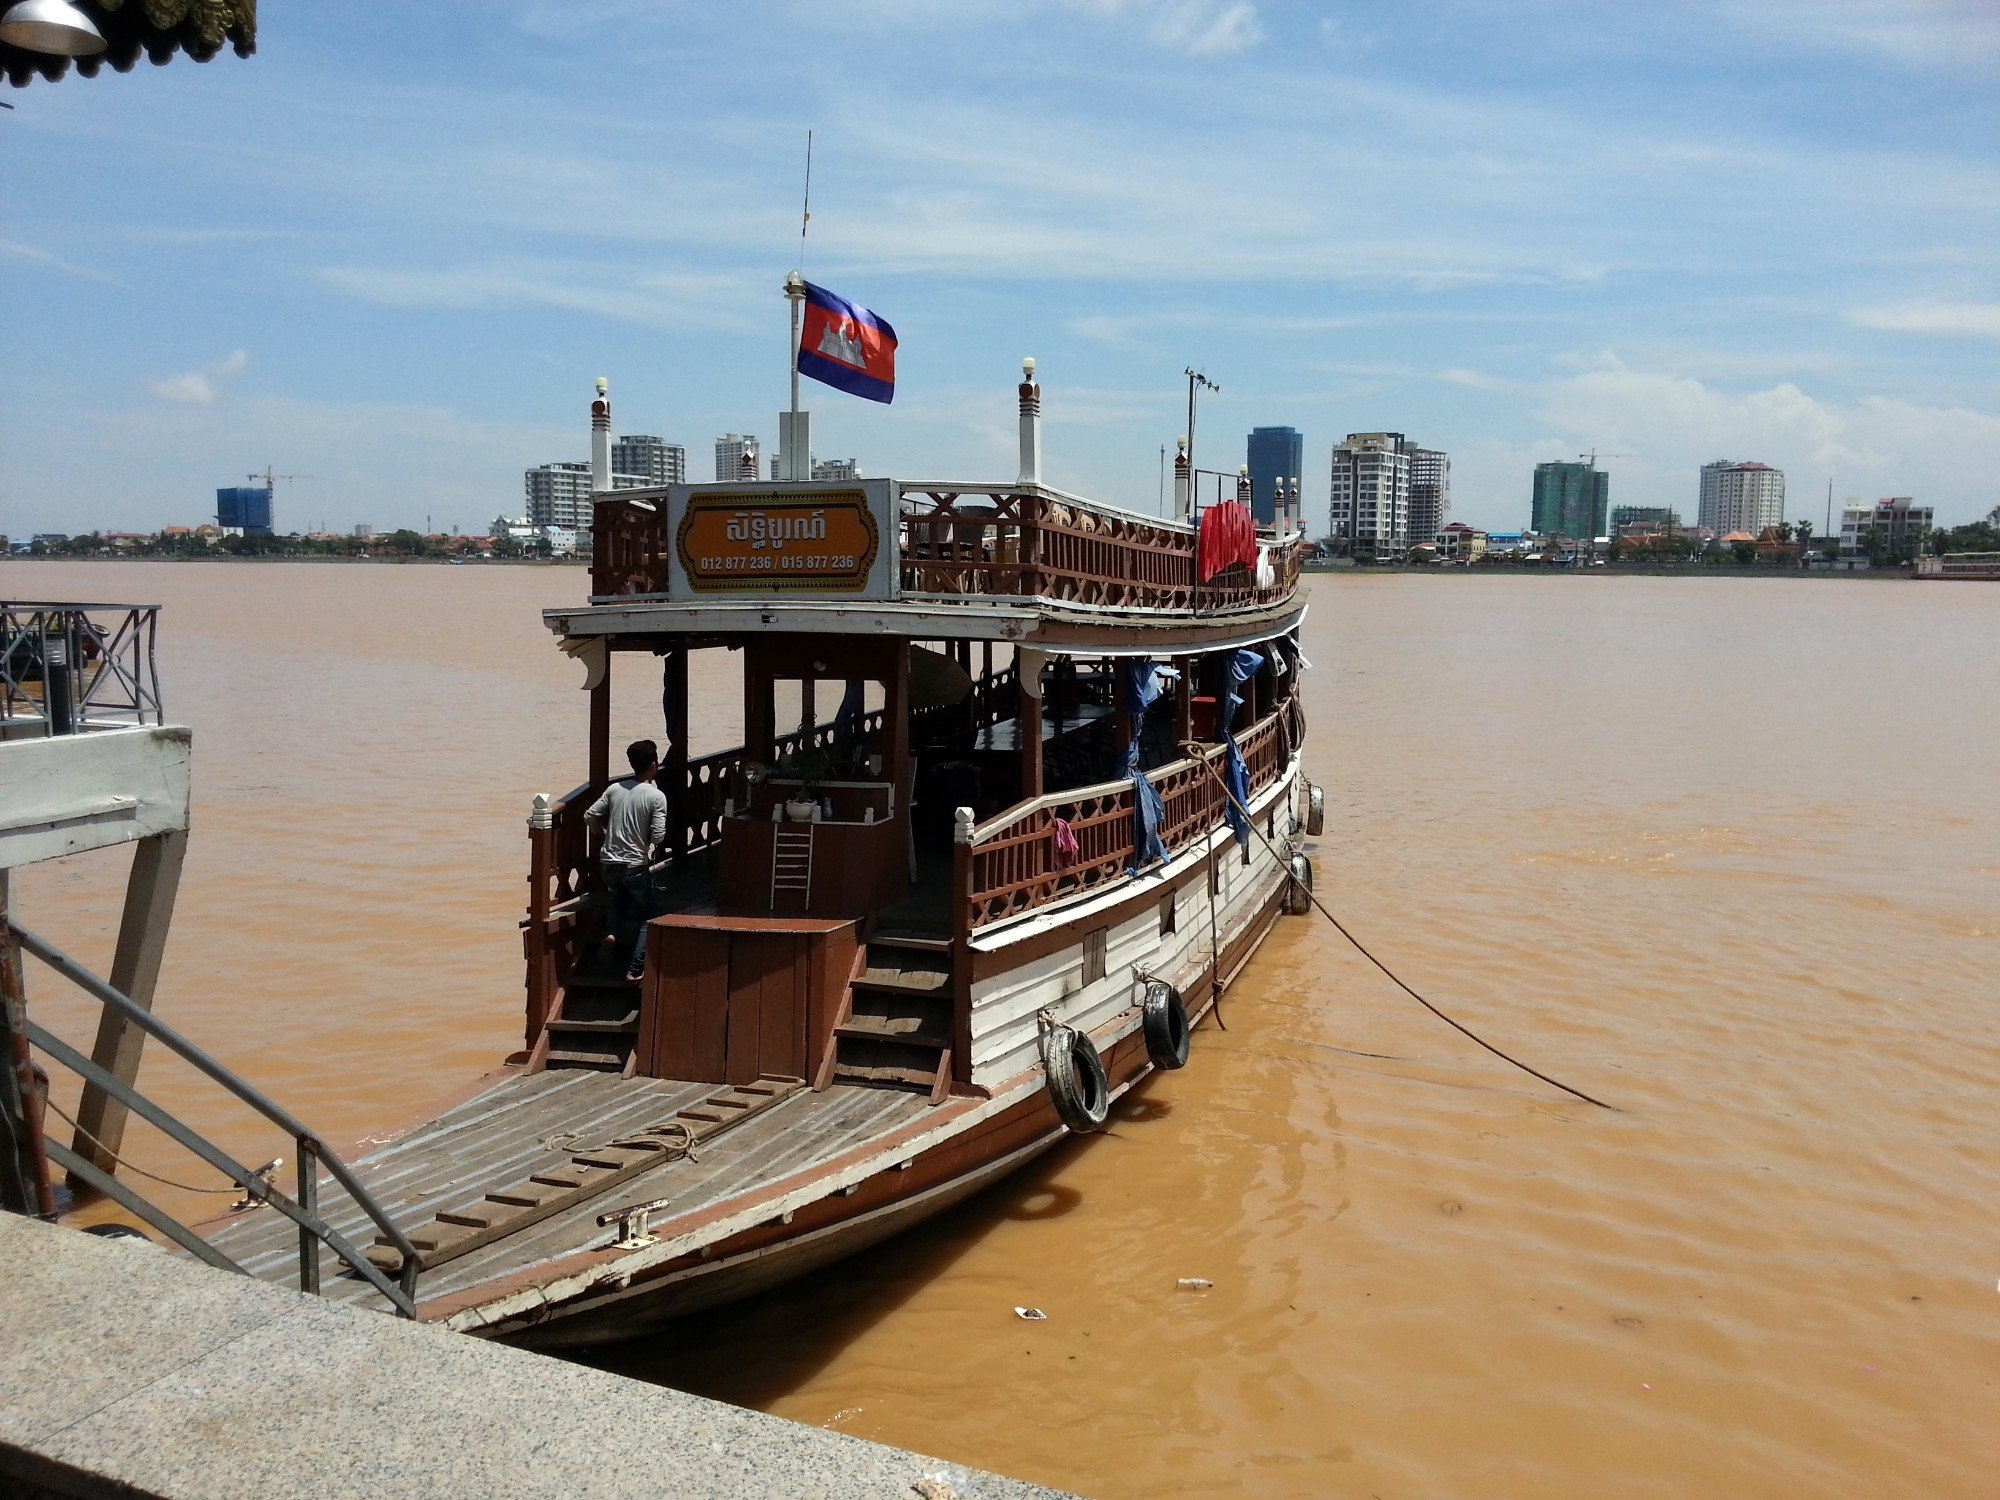 Sunset cruiser in Phnom Penh